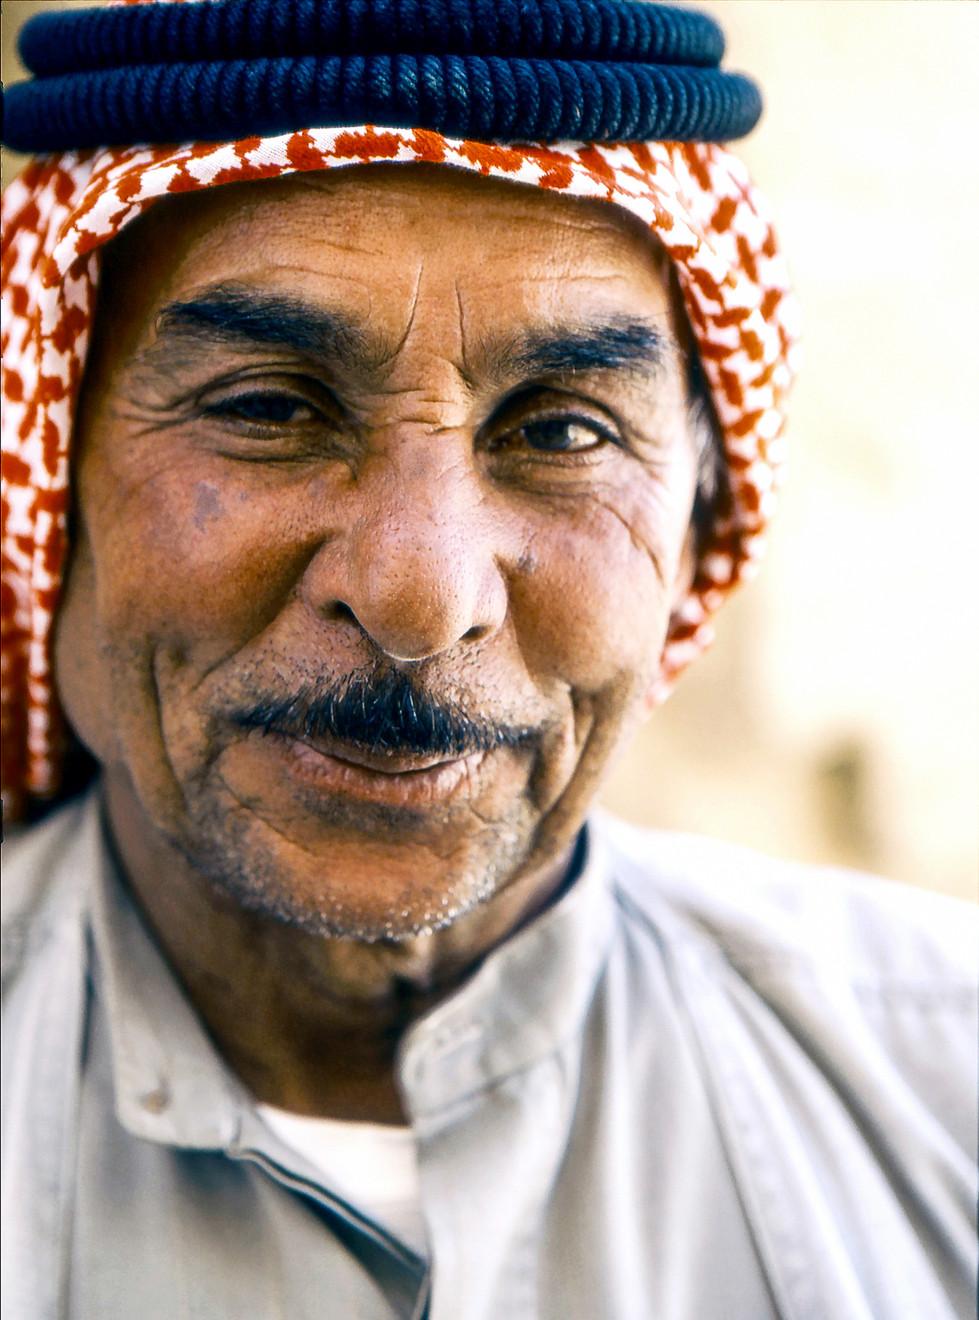 The Caretaker of Dura Europos